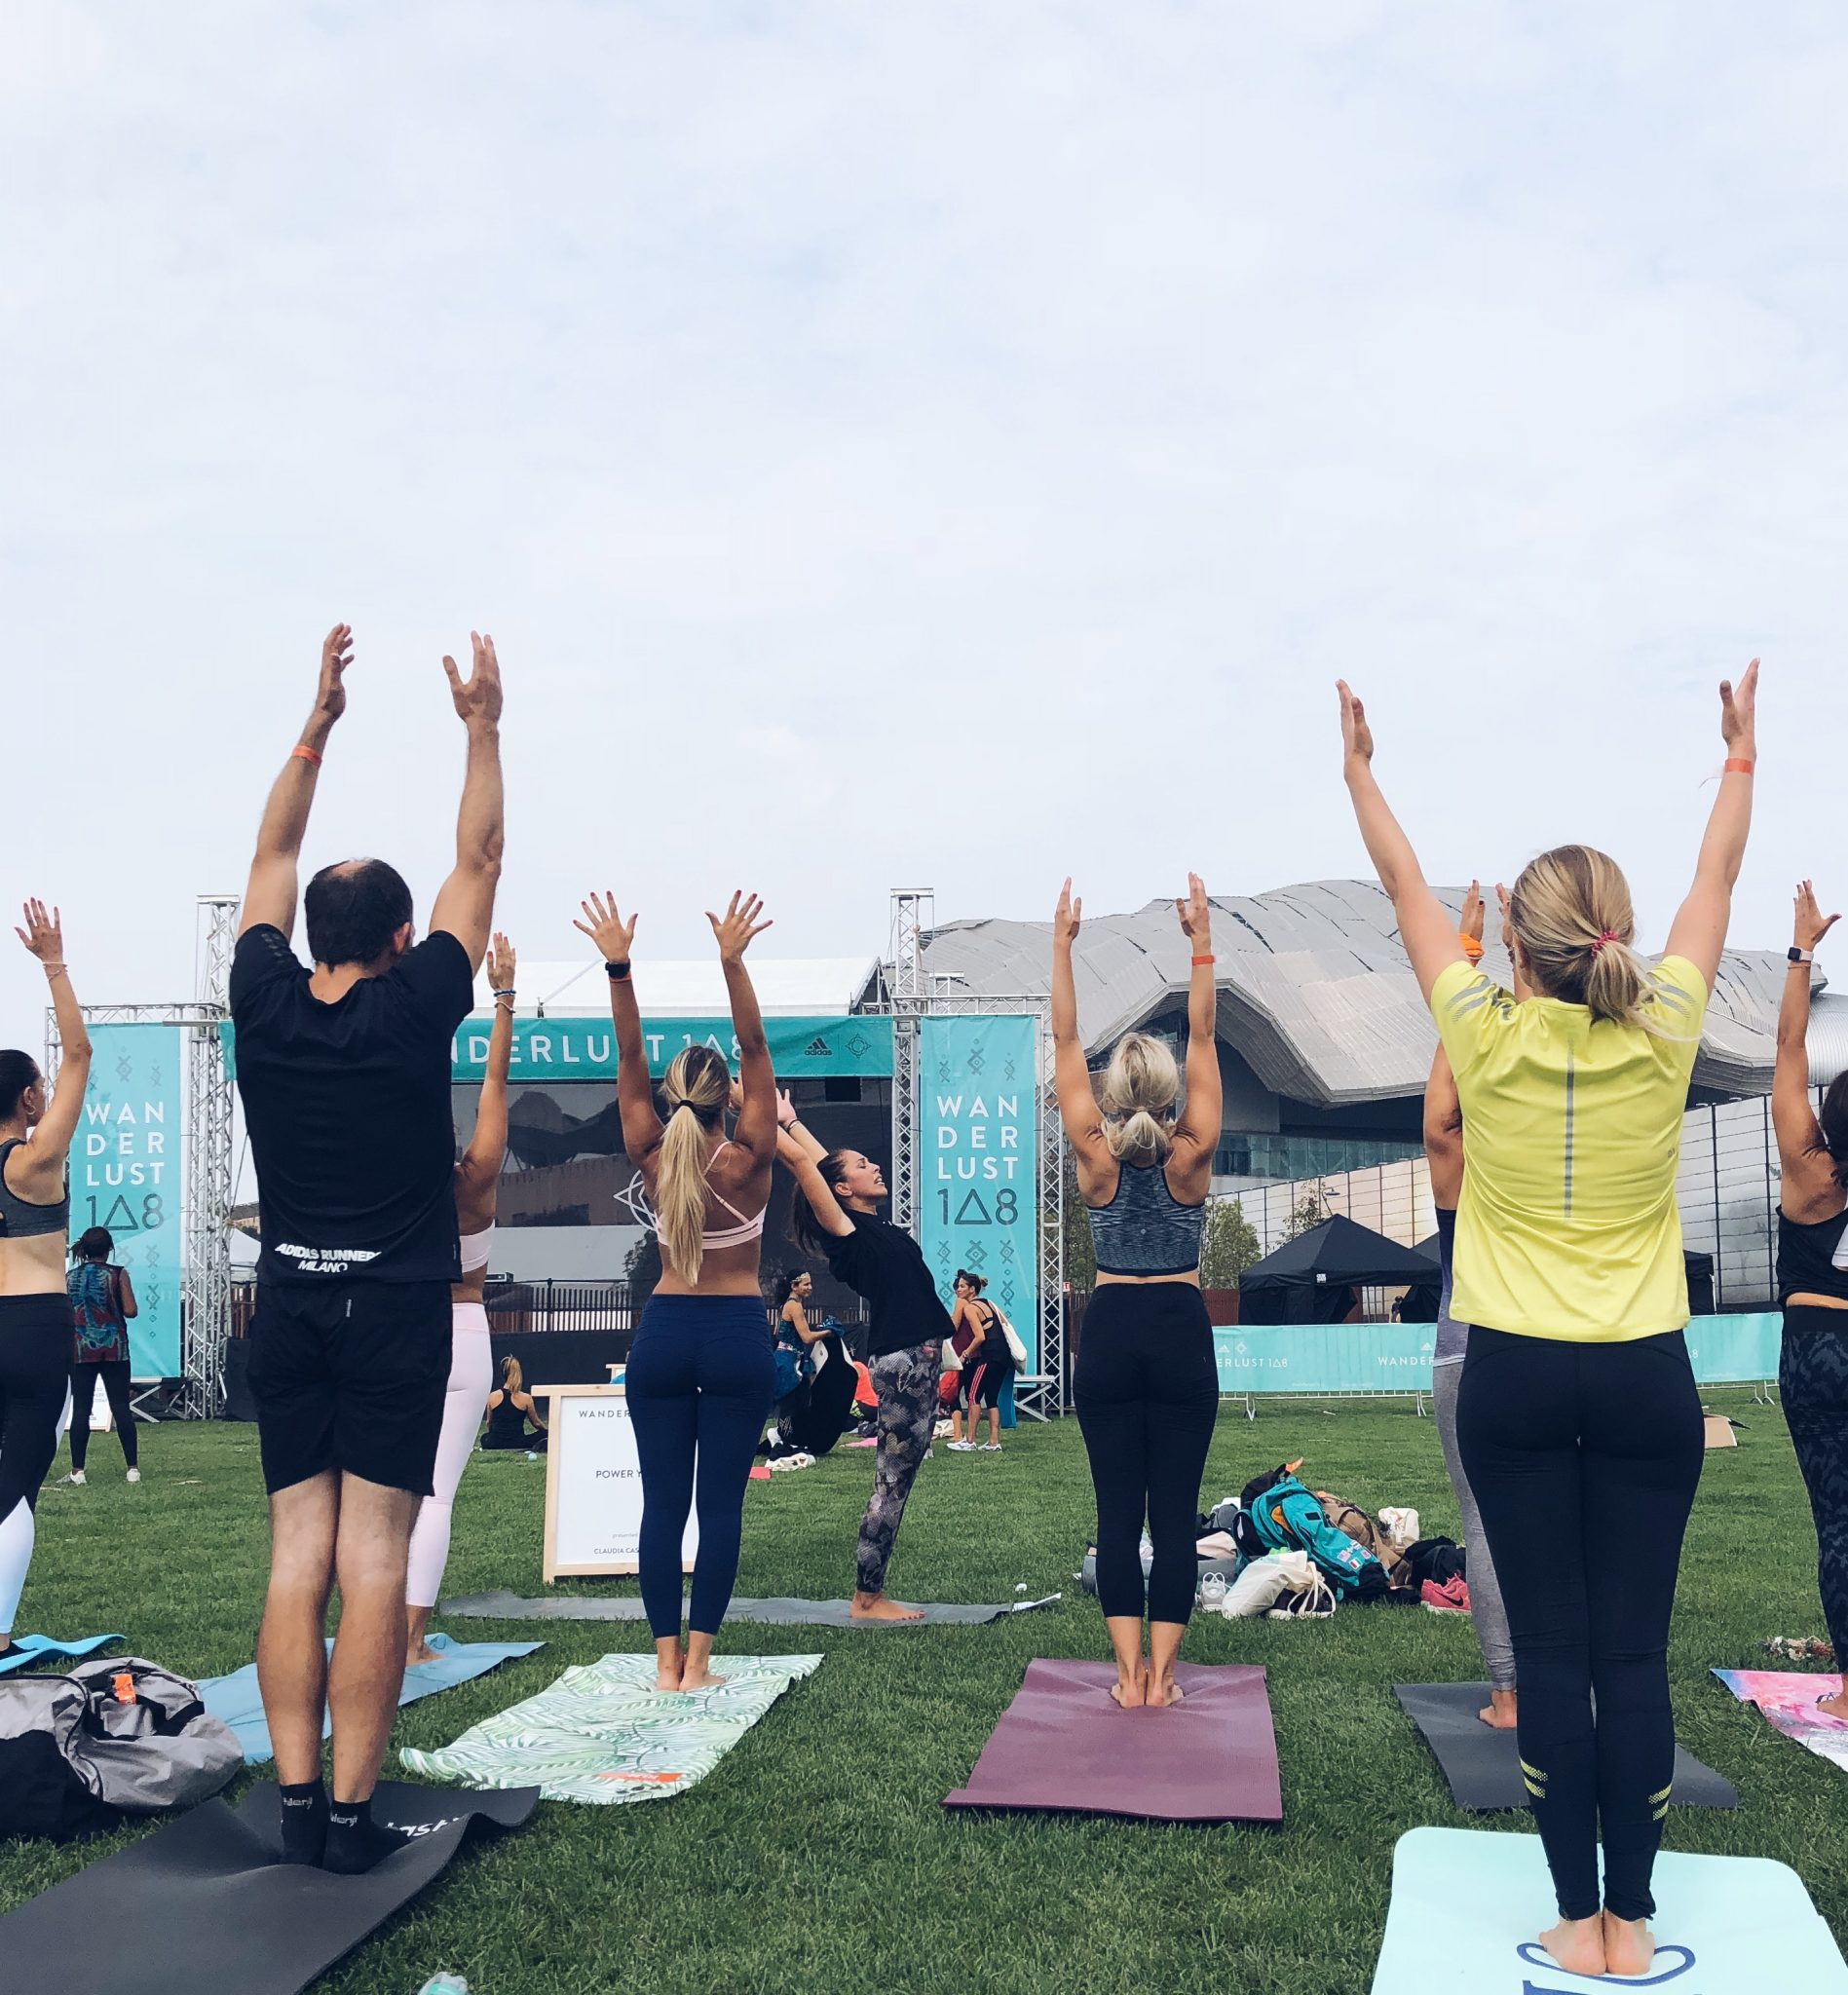 Sessione di Yoga durante il MIndful Triathlon - Wanderlust 108 a Milano - foto di tatianaberlaffa.com